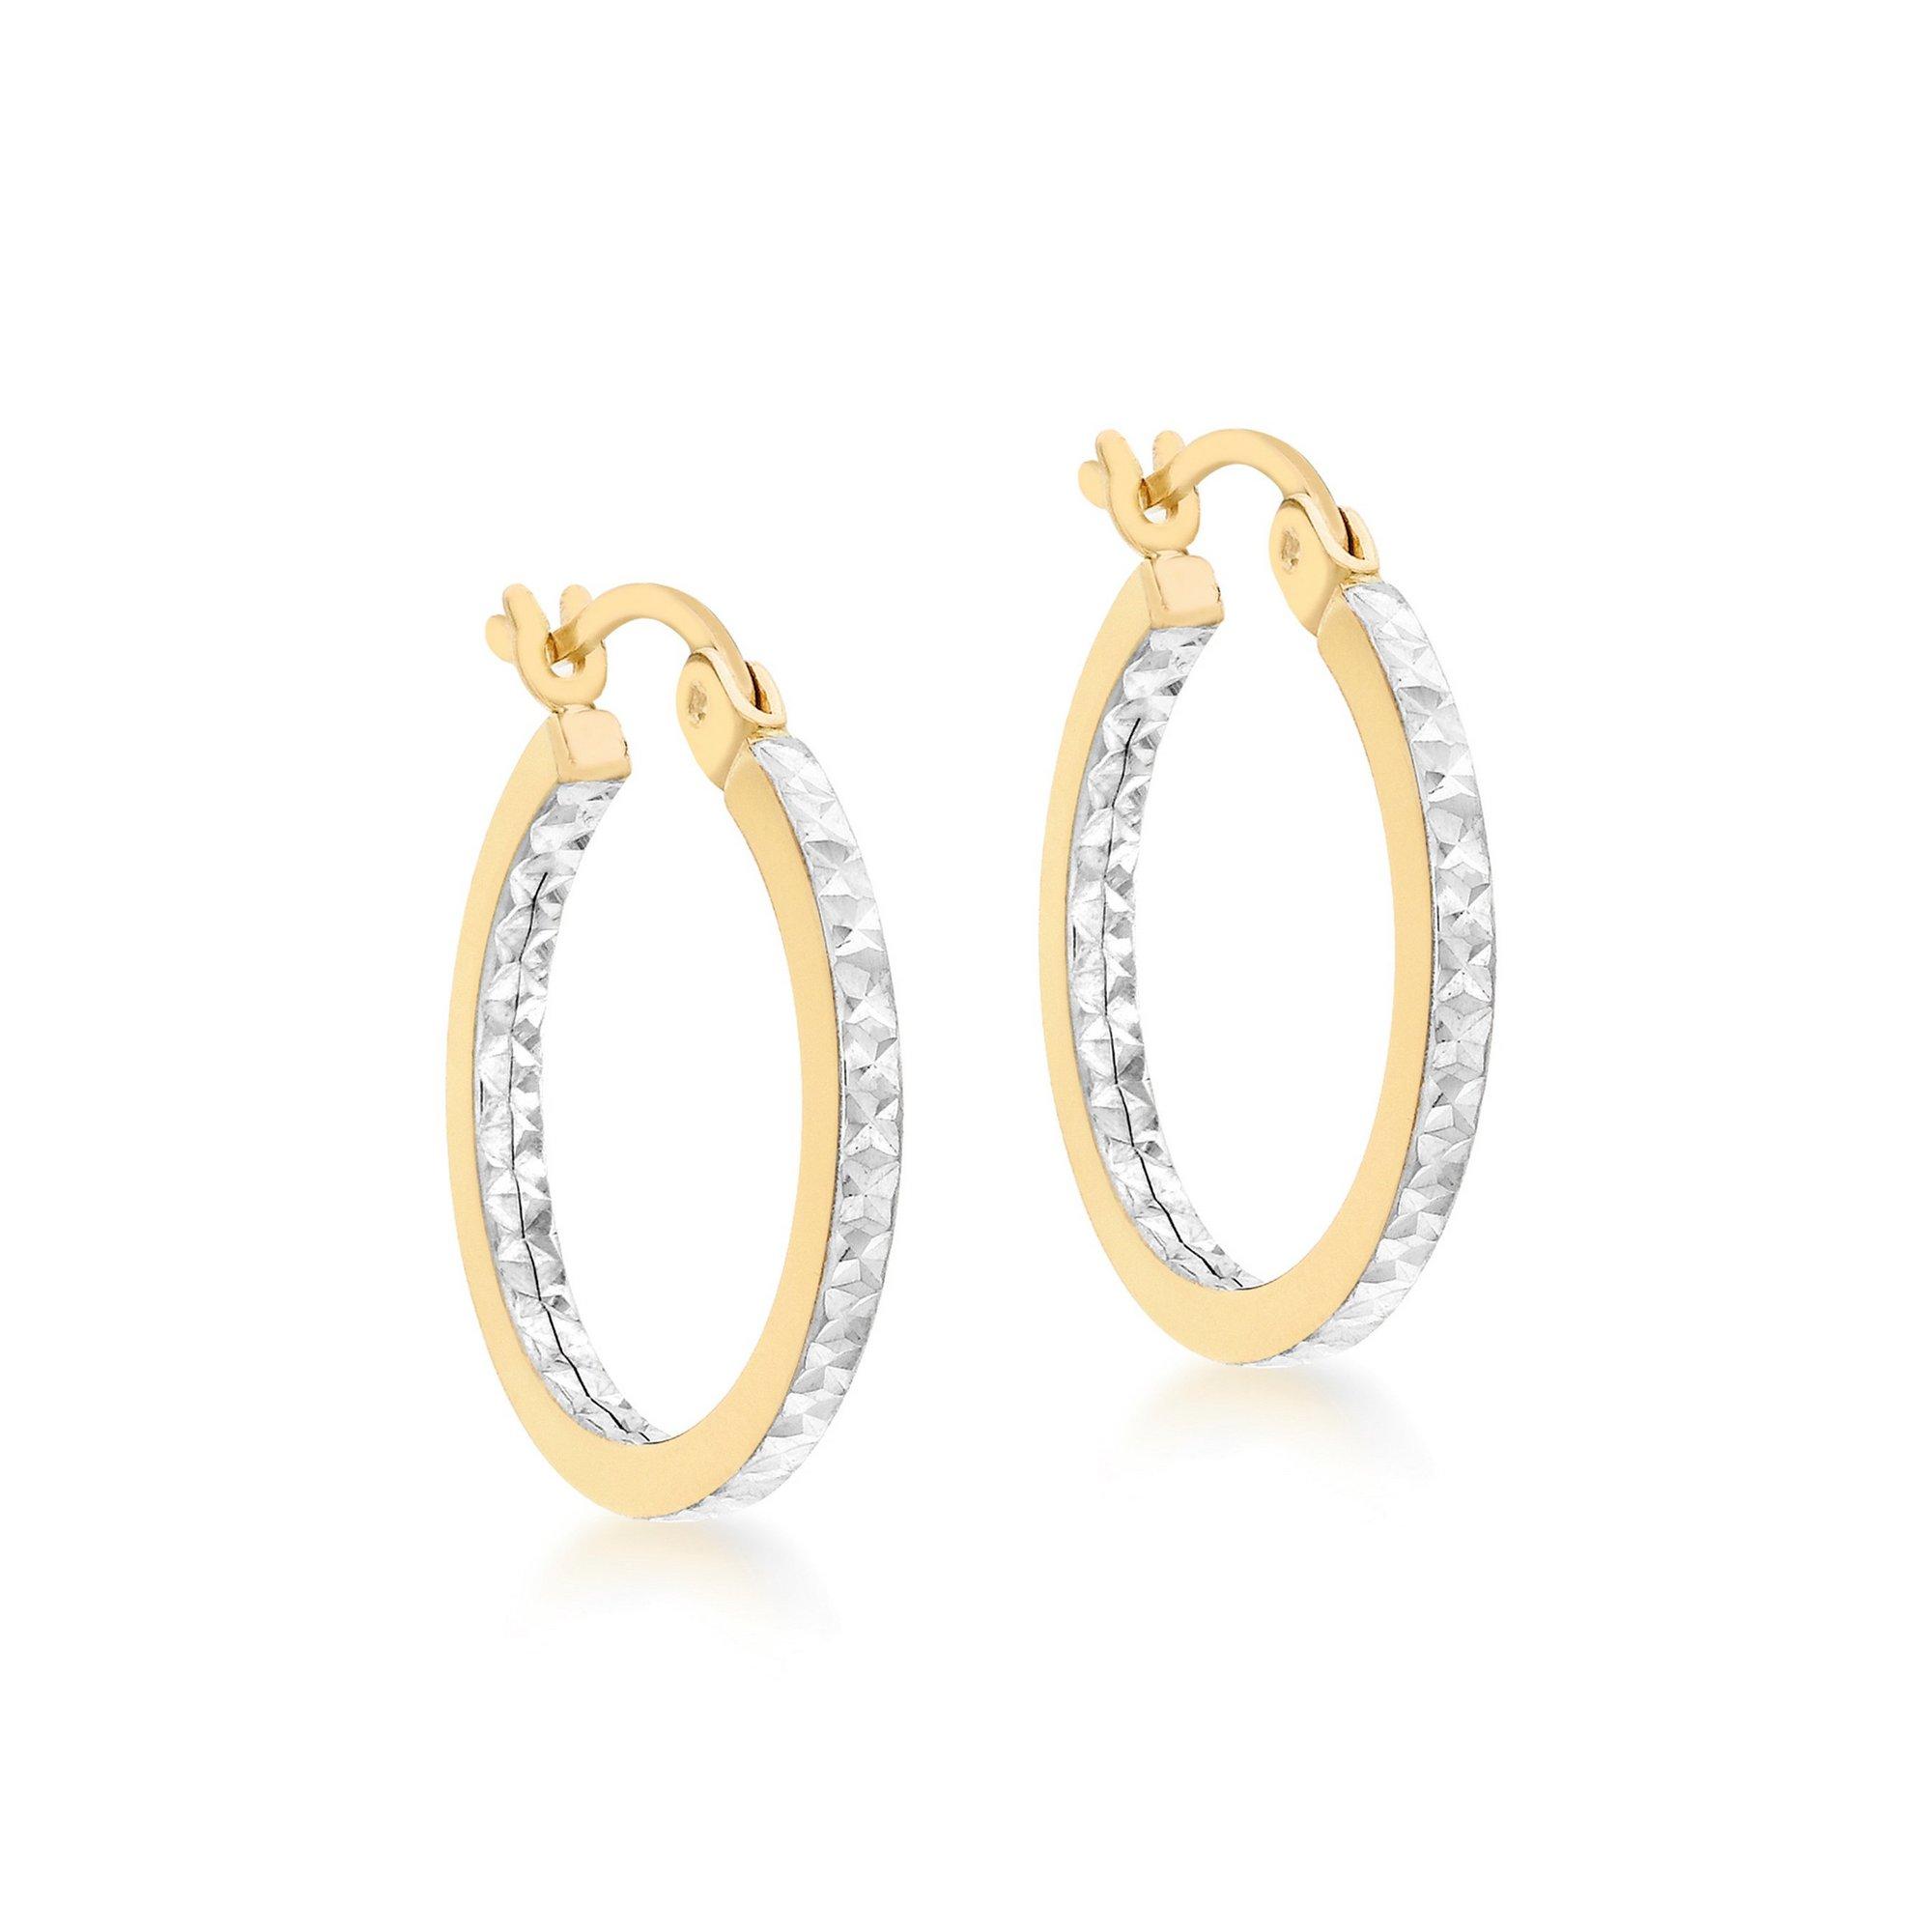 Image of 2-Tone 9ct Gold 18mm Diamond Cut Creole Earrings